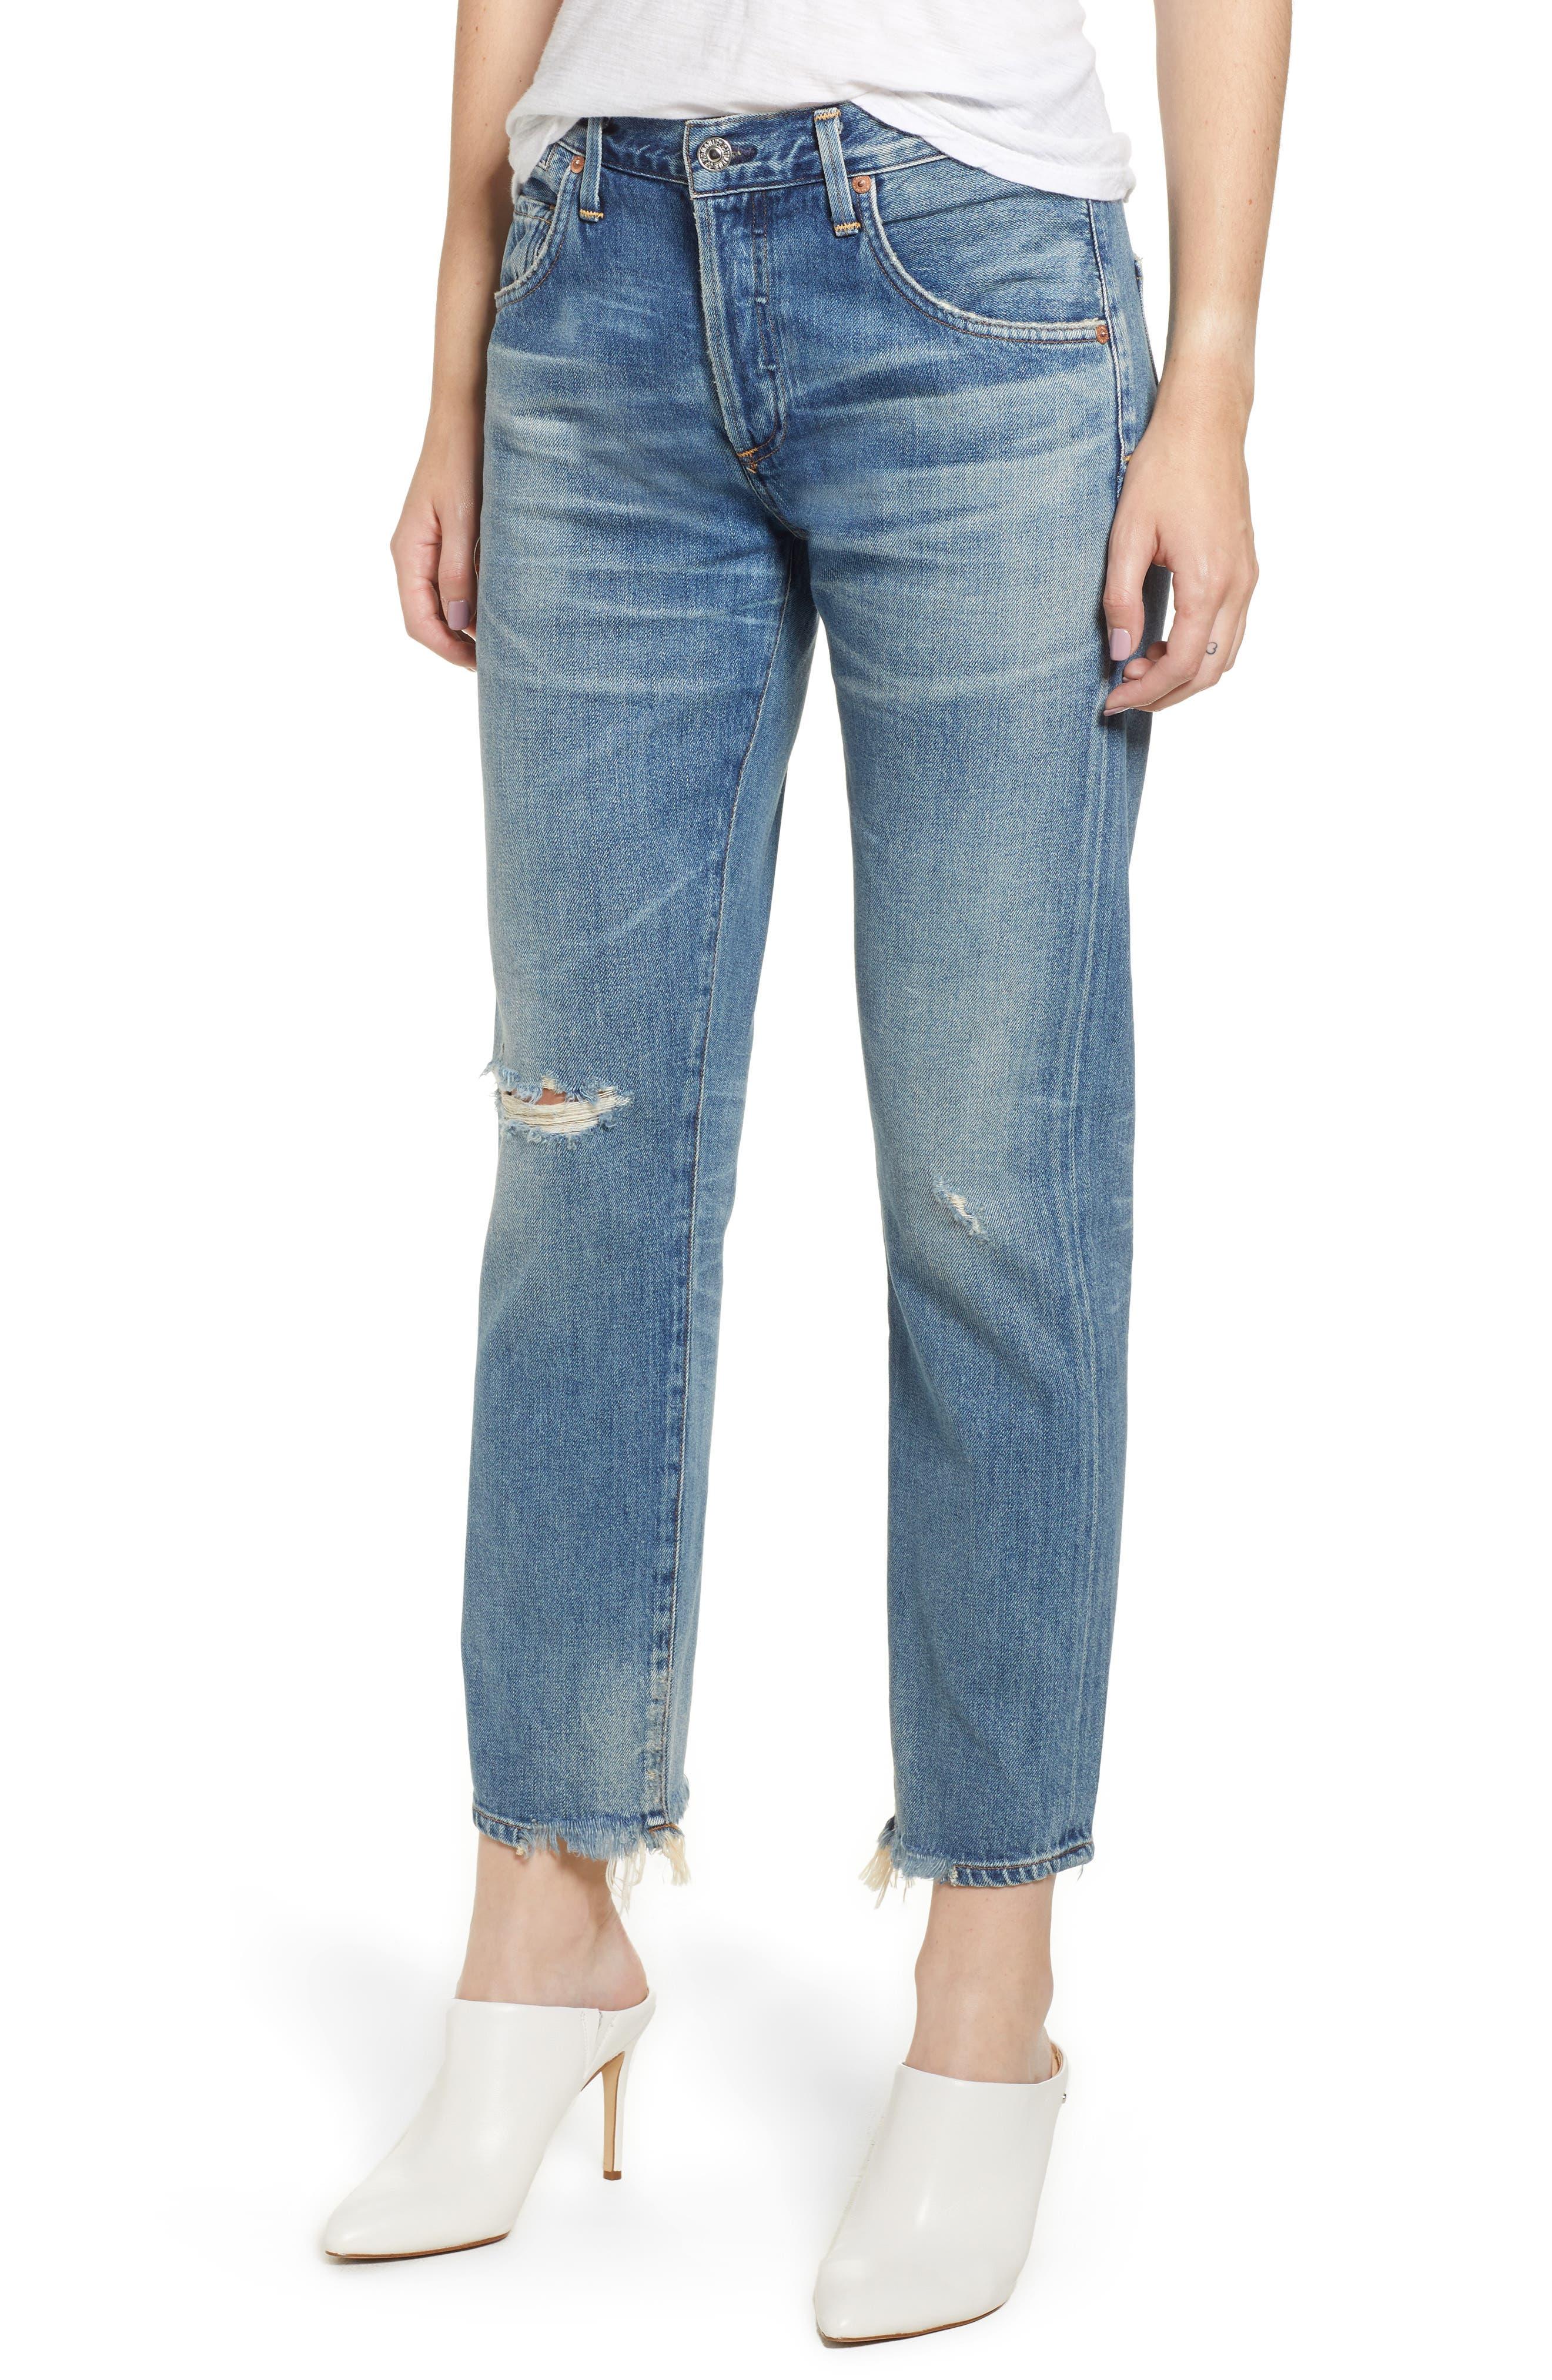 CITIZENS OF HUMANITY Emerson Slim Boyfriend Jeans, Main, color, HAVEN